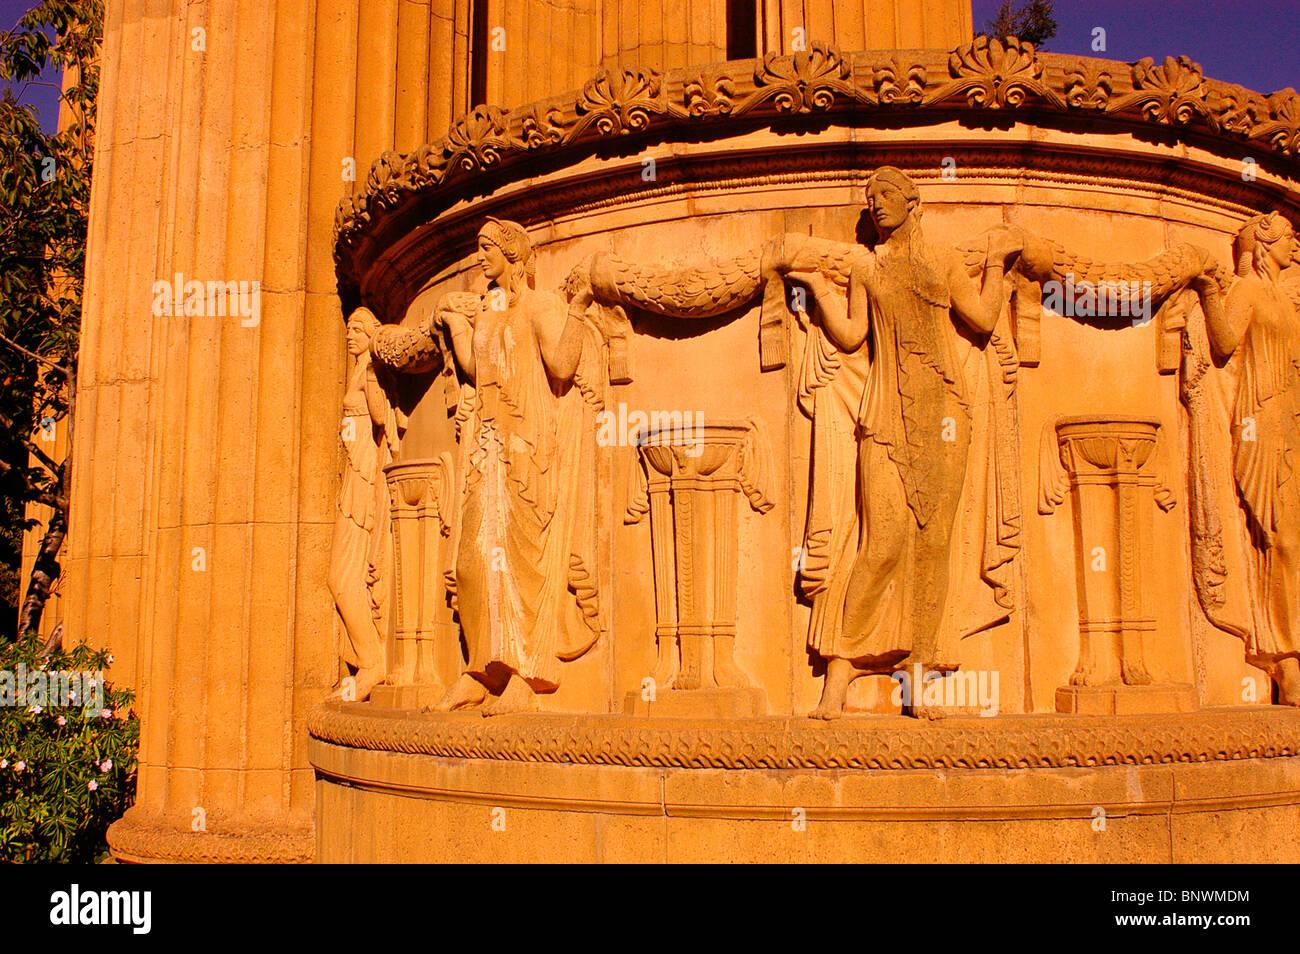 Palace of Fine Arts Photo Stock